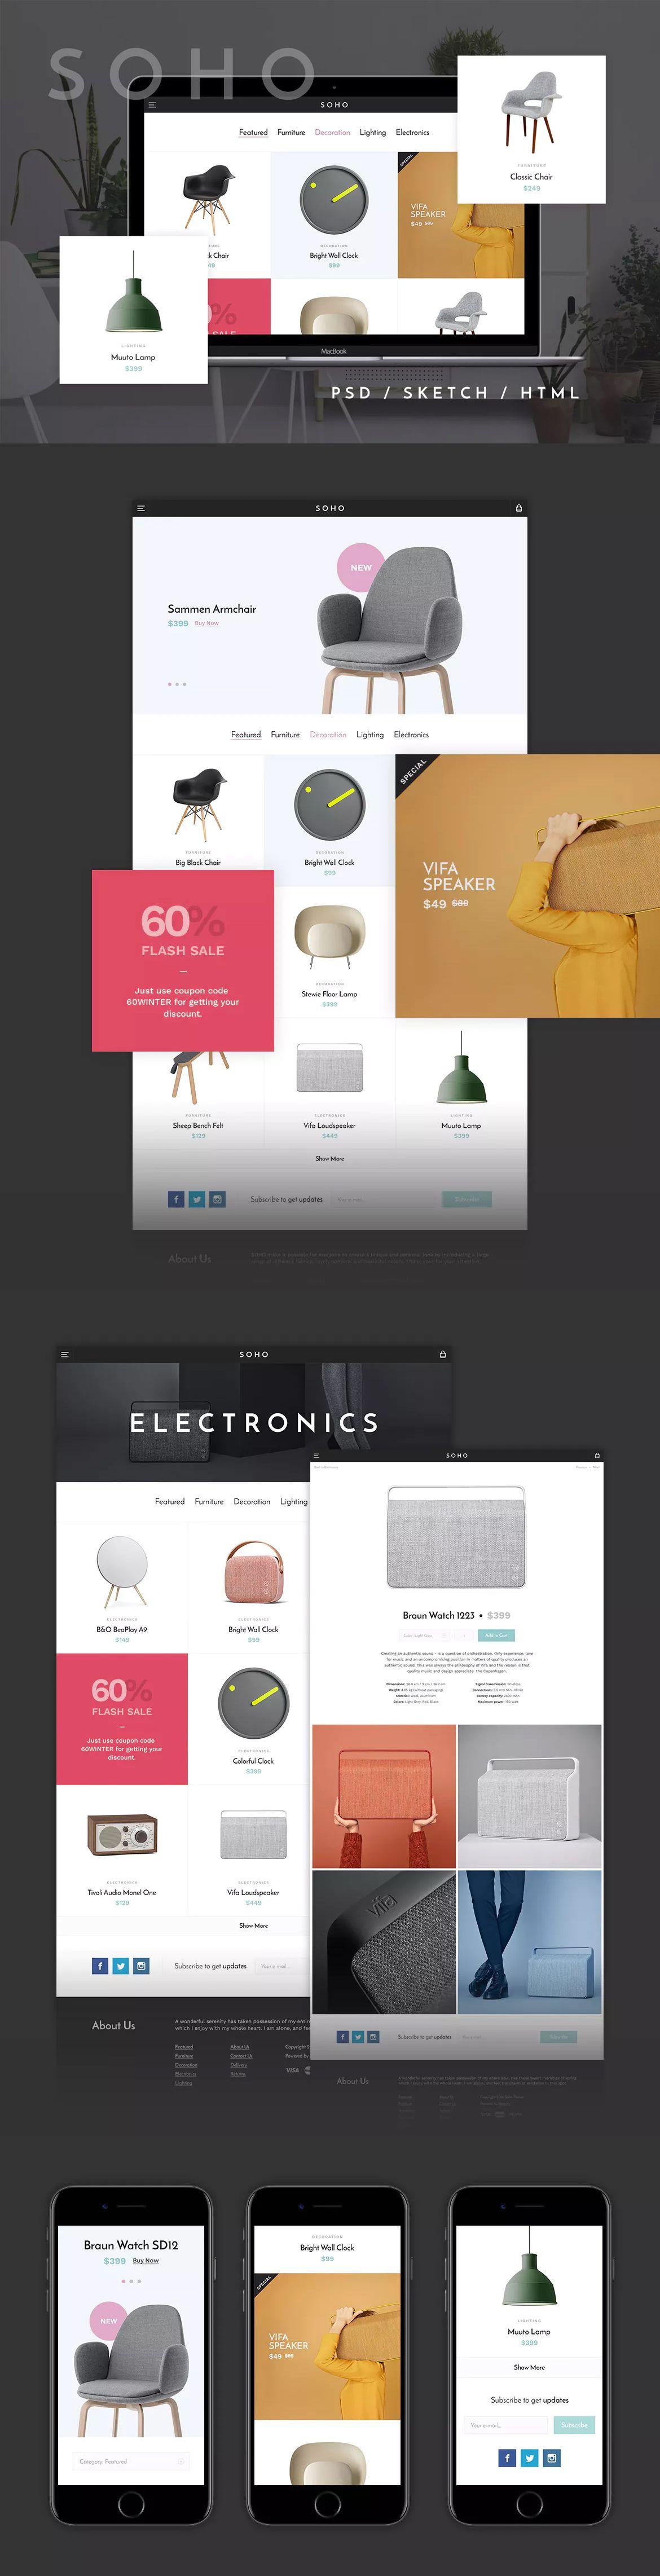 Soho Template (PSD, Sketch, HTML)   HTML Website Templates ...